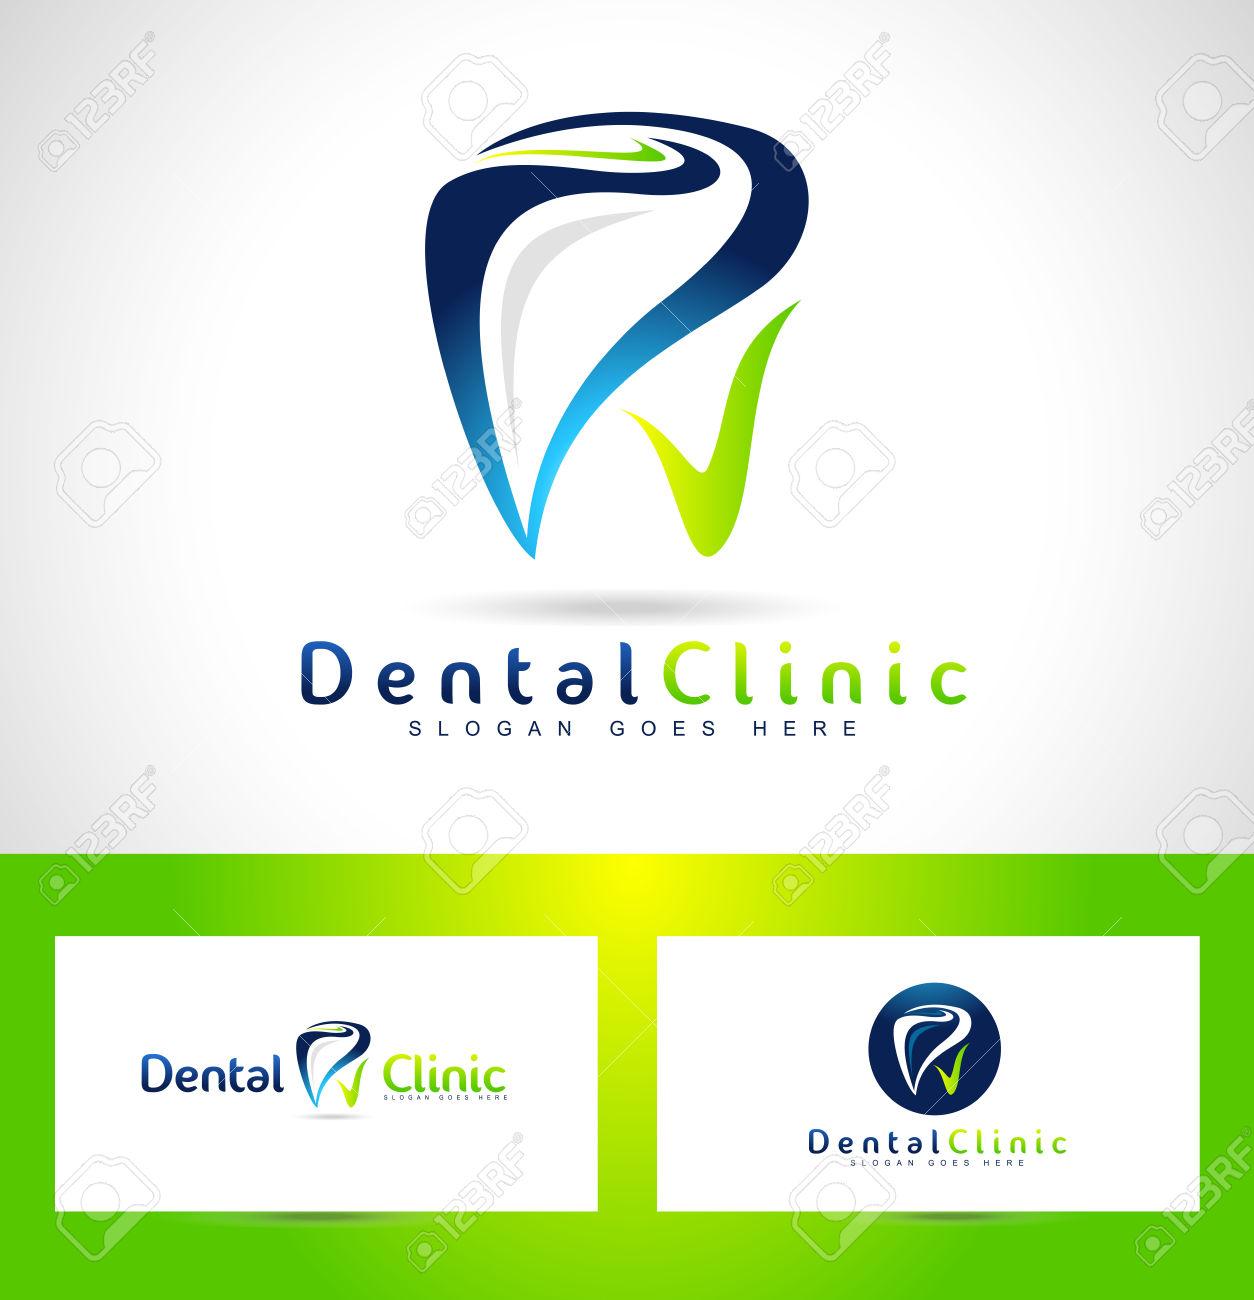 Chirugien Dentiste M.BEGON